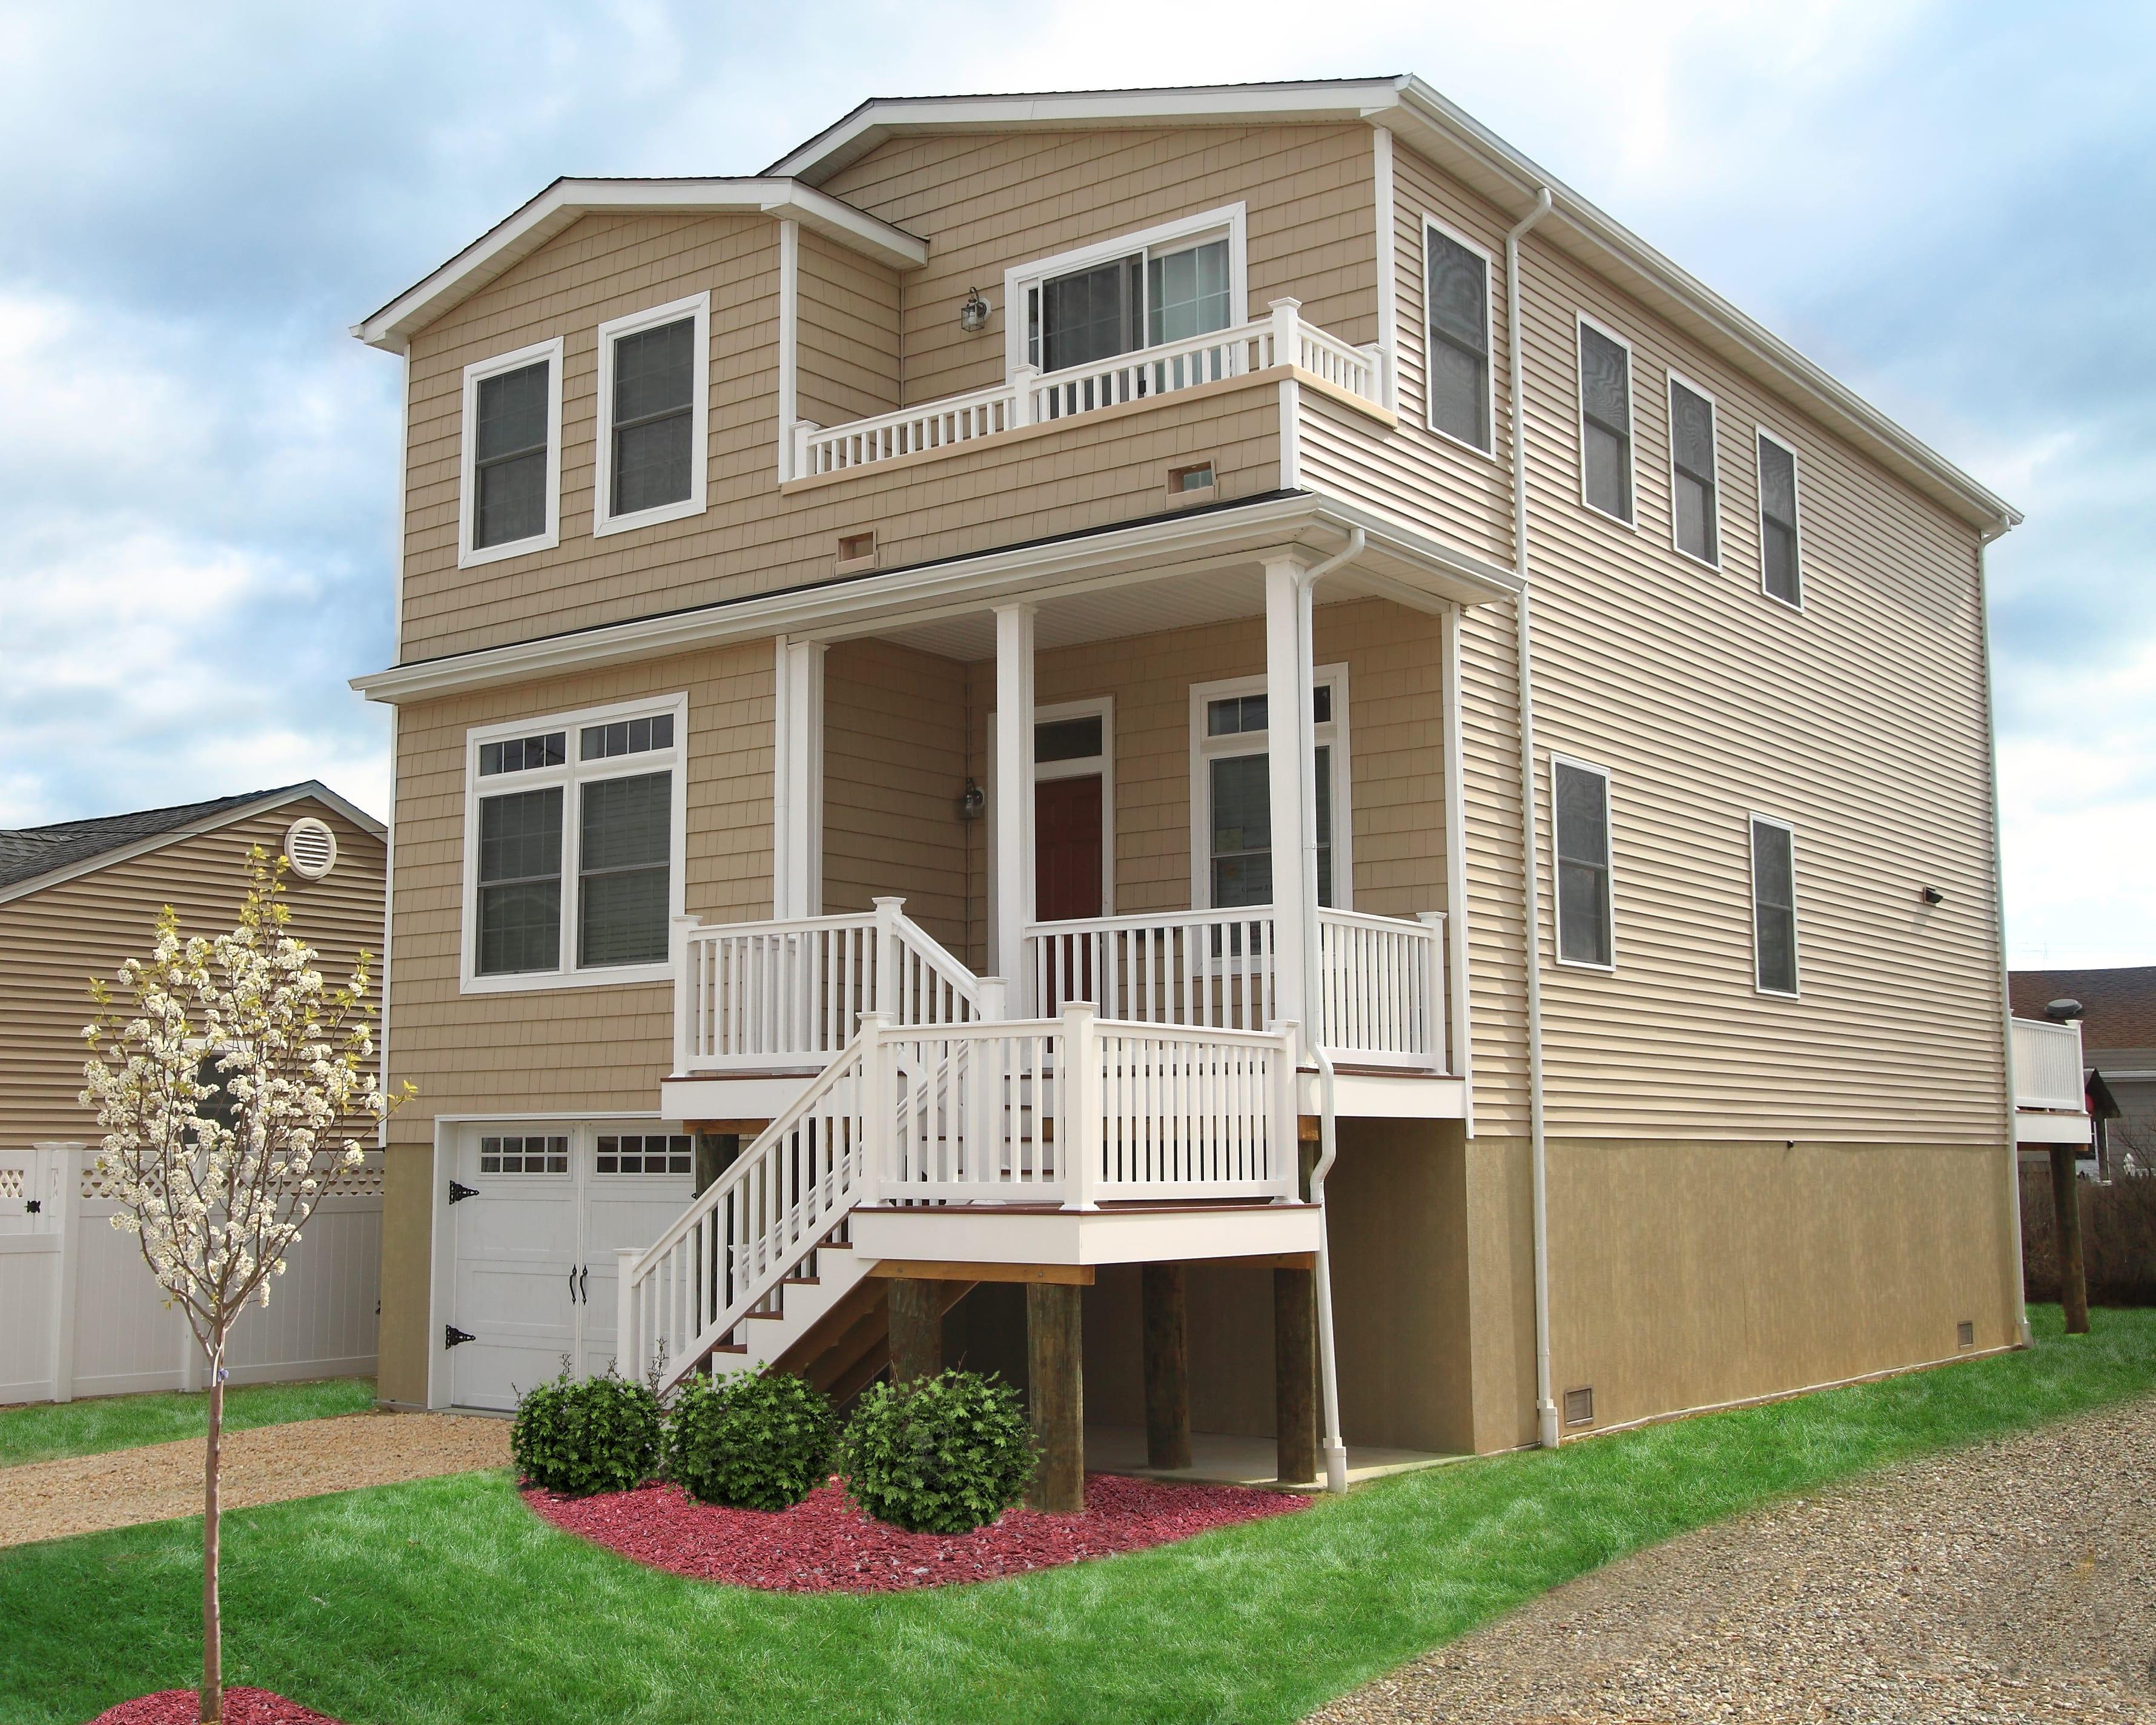 Zarrilli Offers Custom Modular Homes On The Jersey Shore